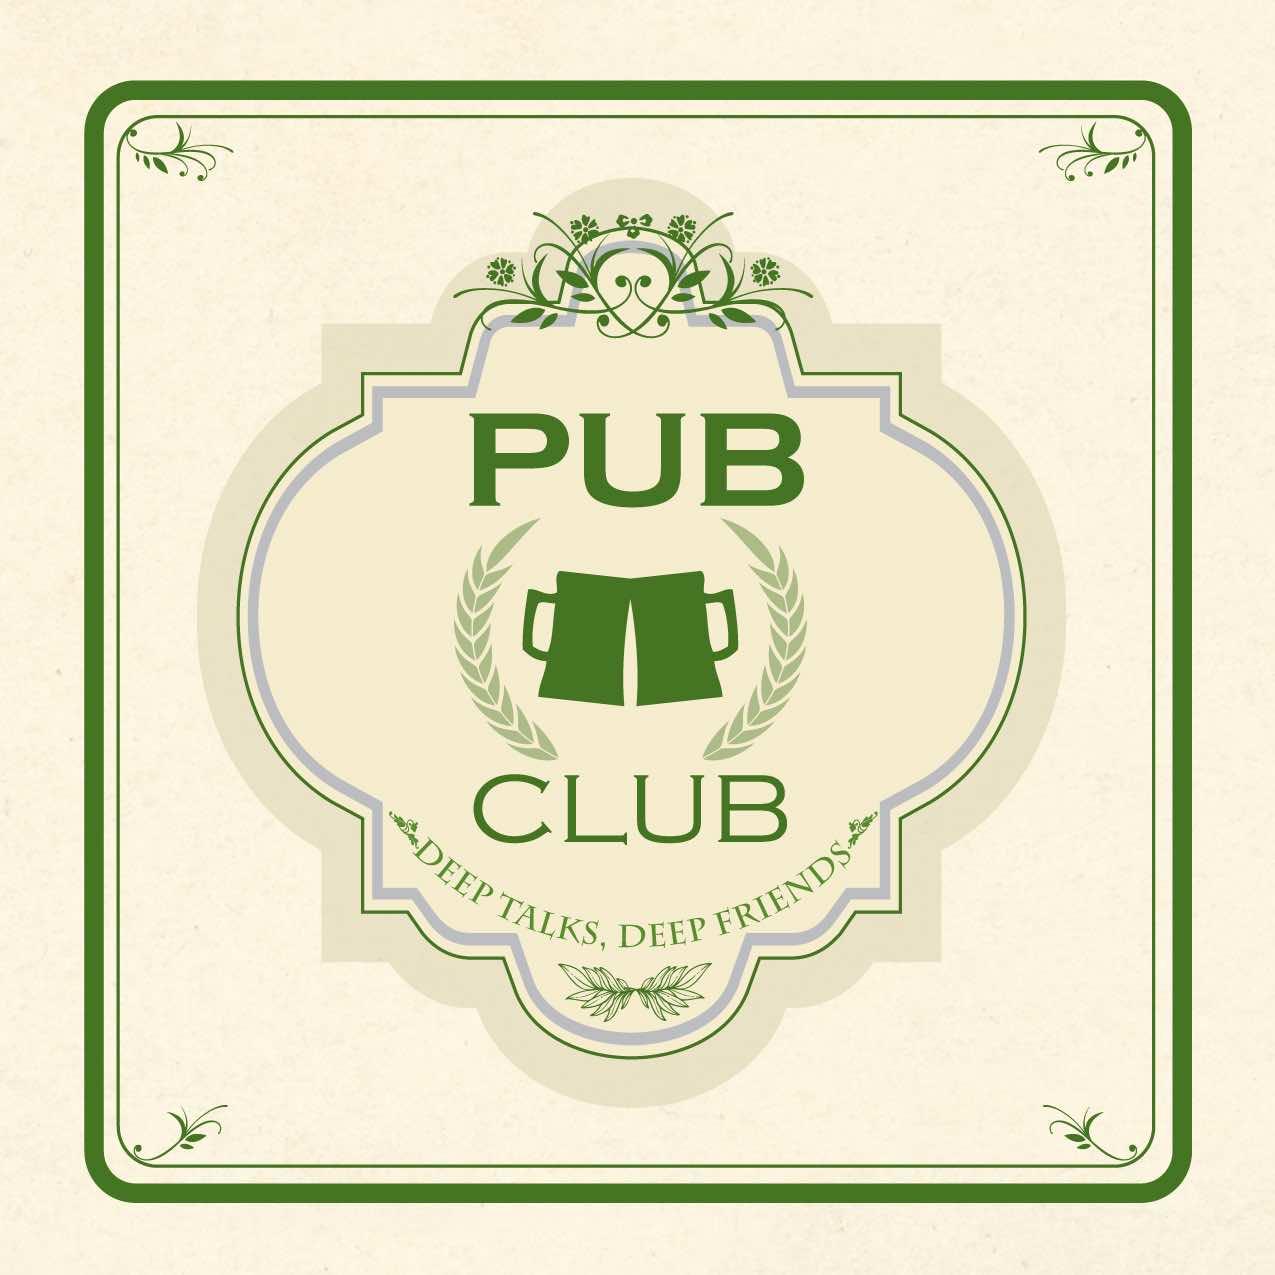 pubclubfrontlow copy.jpg